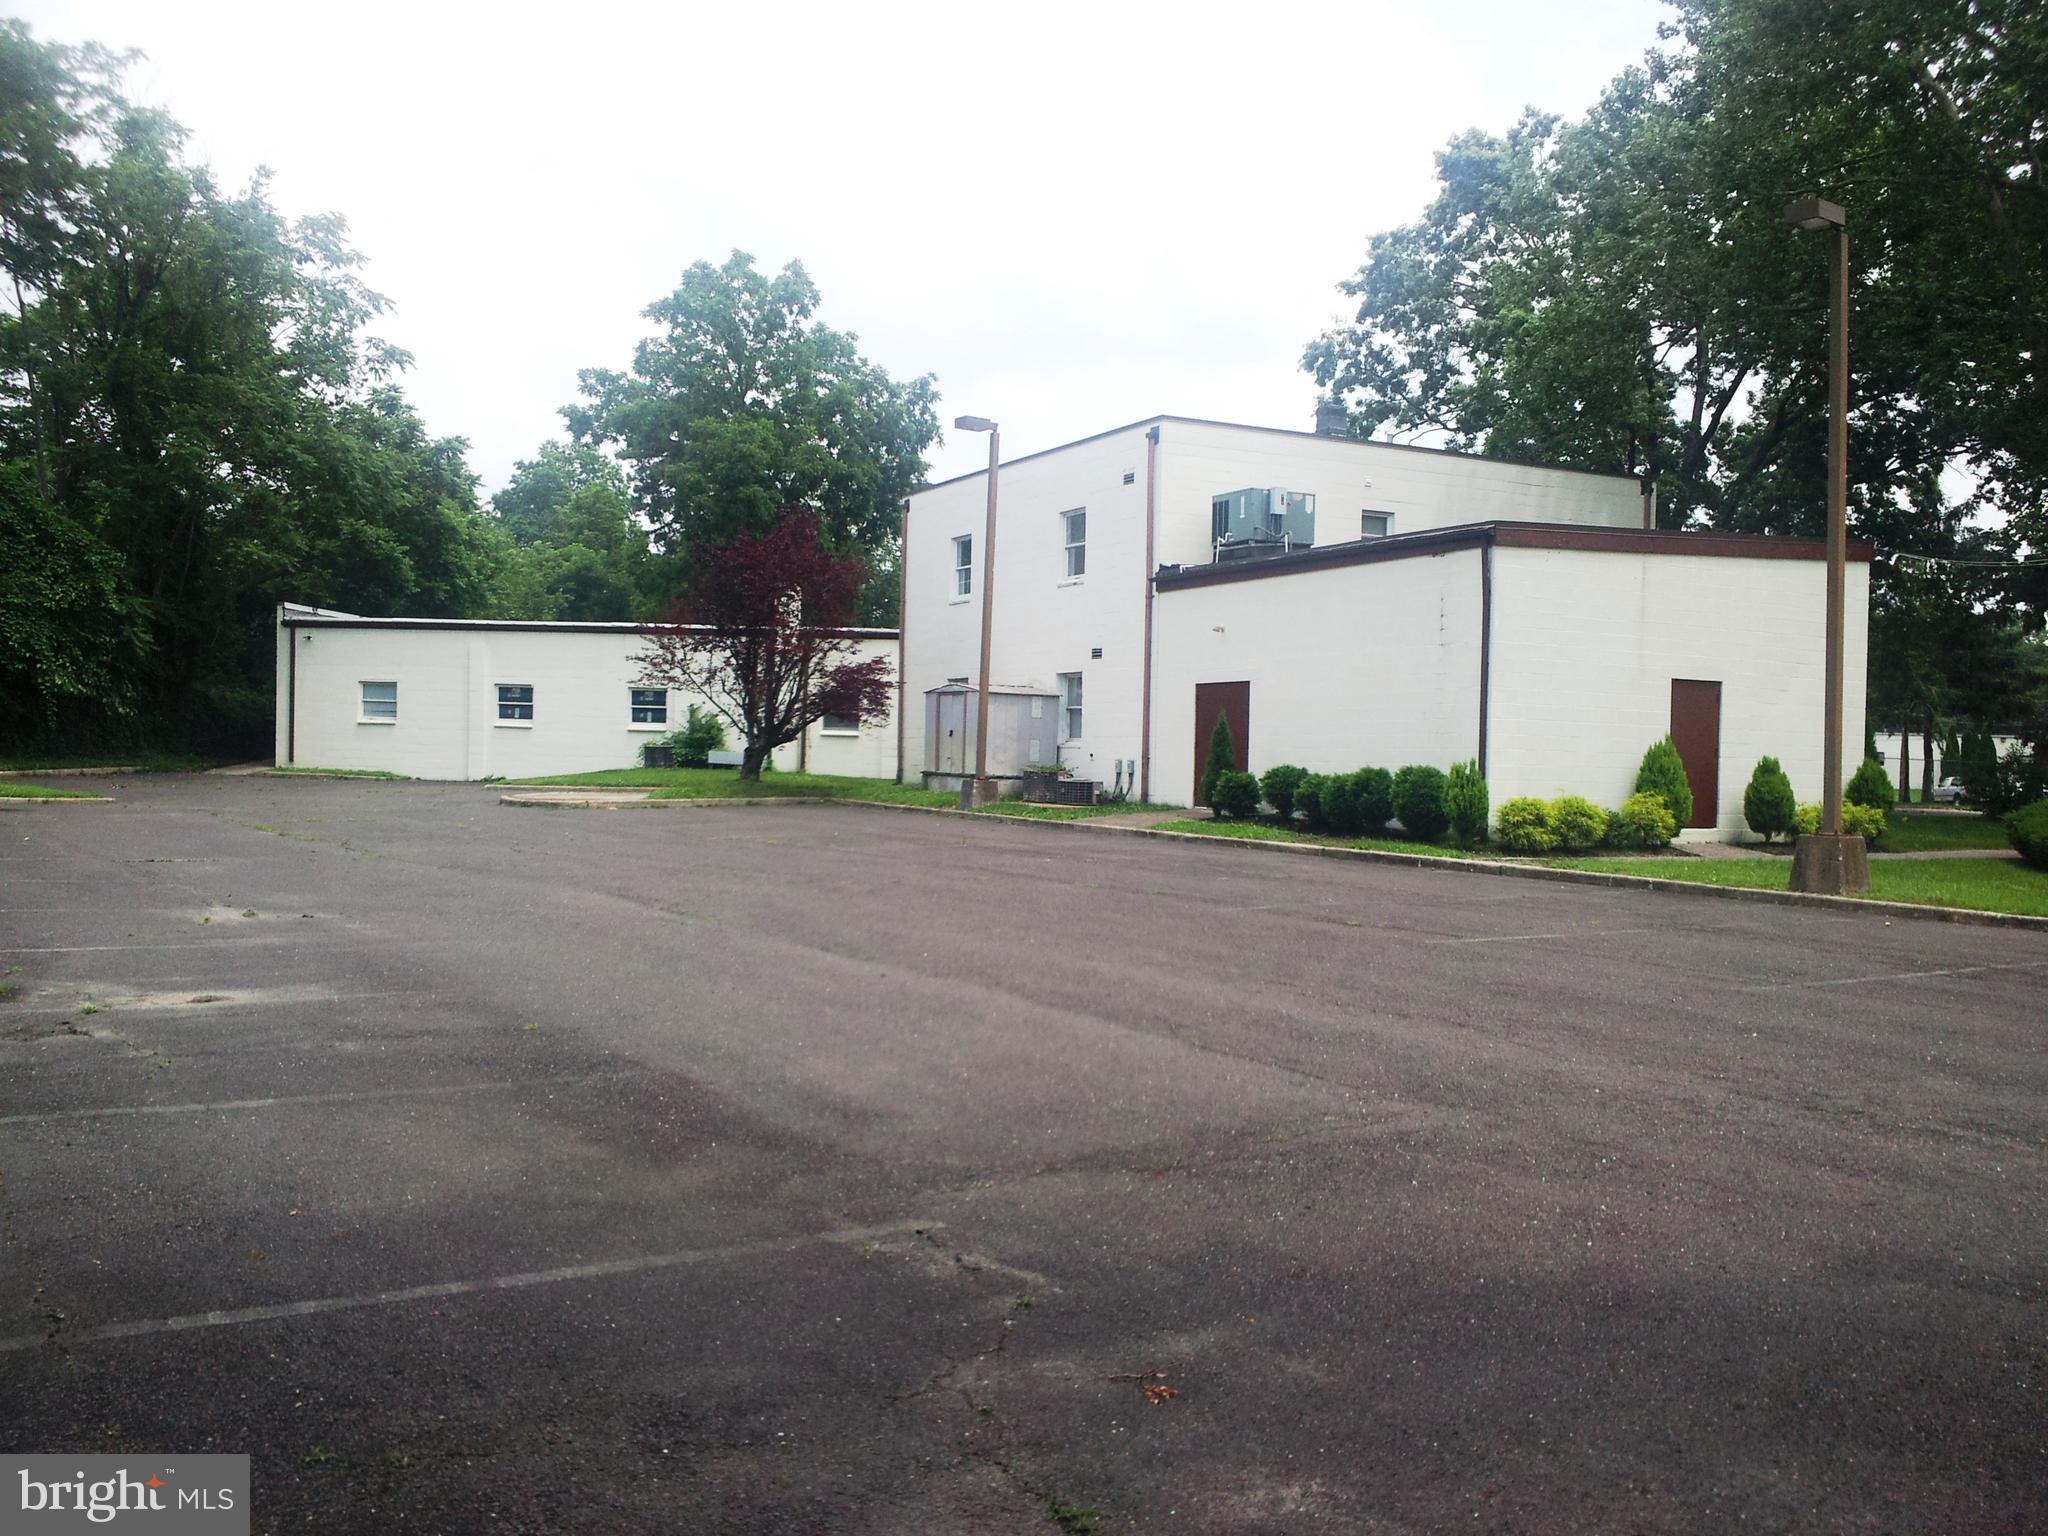 10-16 REEVES AVENUE, HAMILTON, NJ 08610